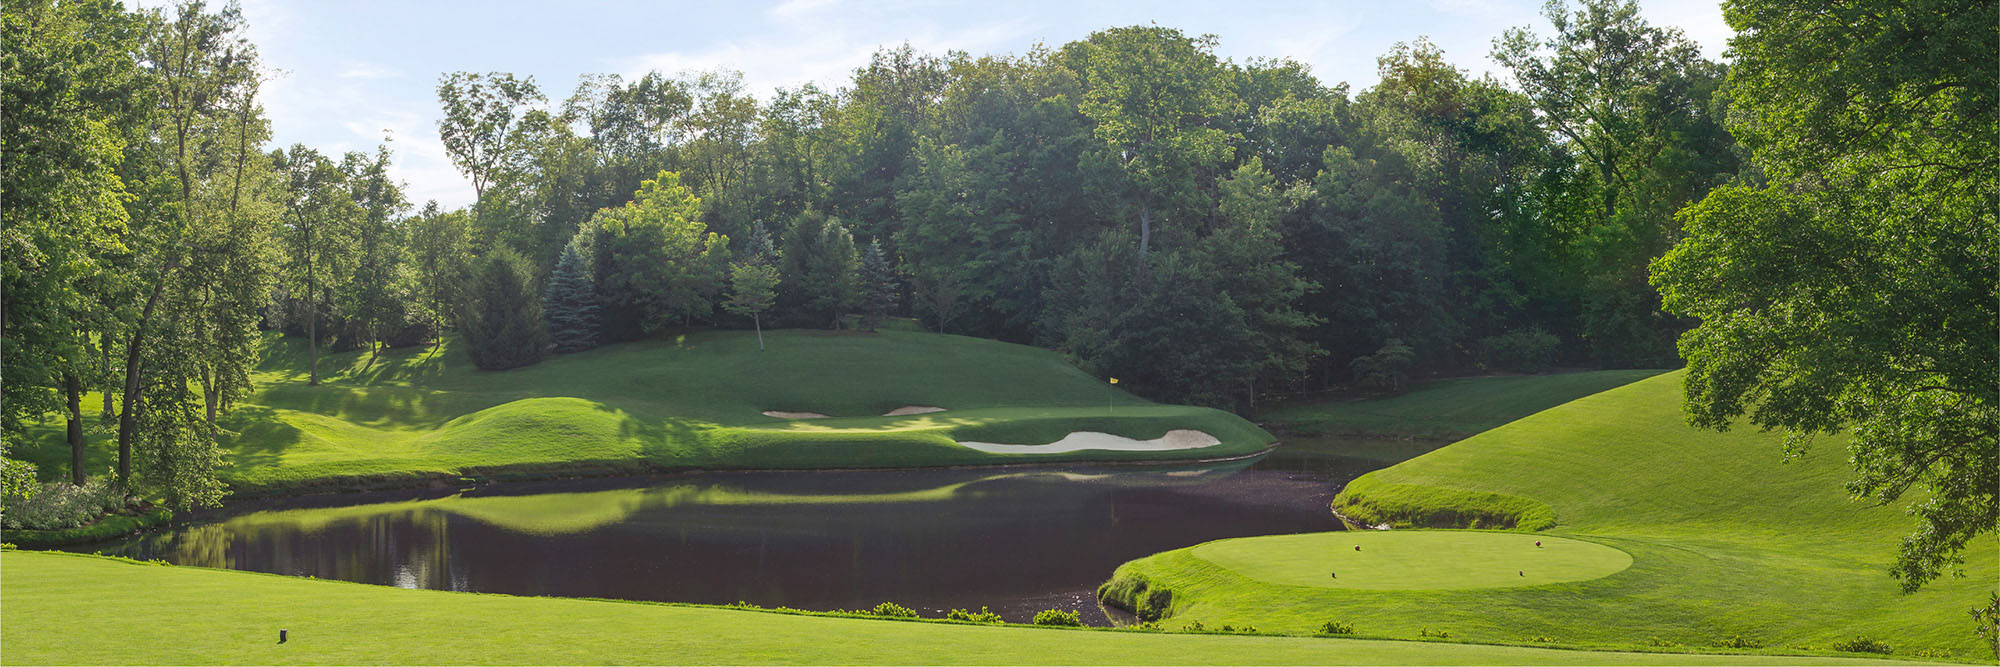 Golf Course Image - Muirfield Village No. 12